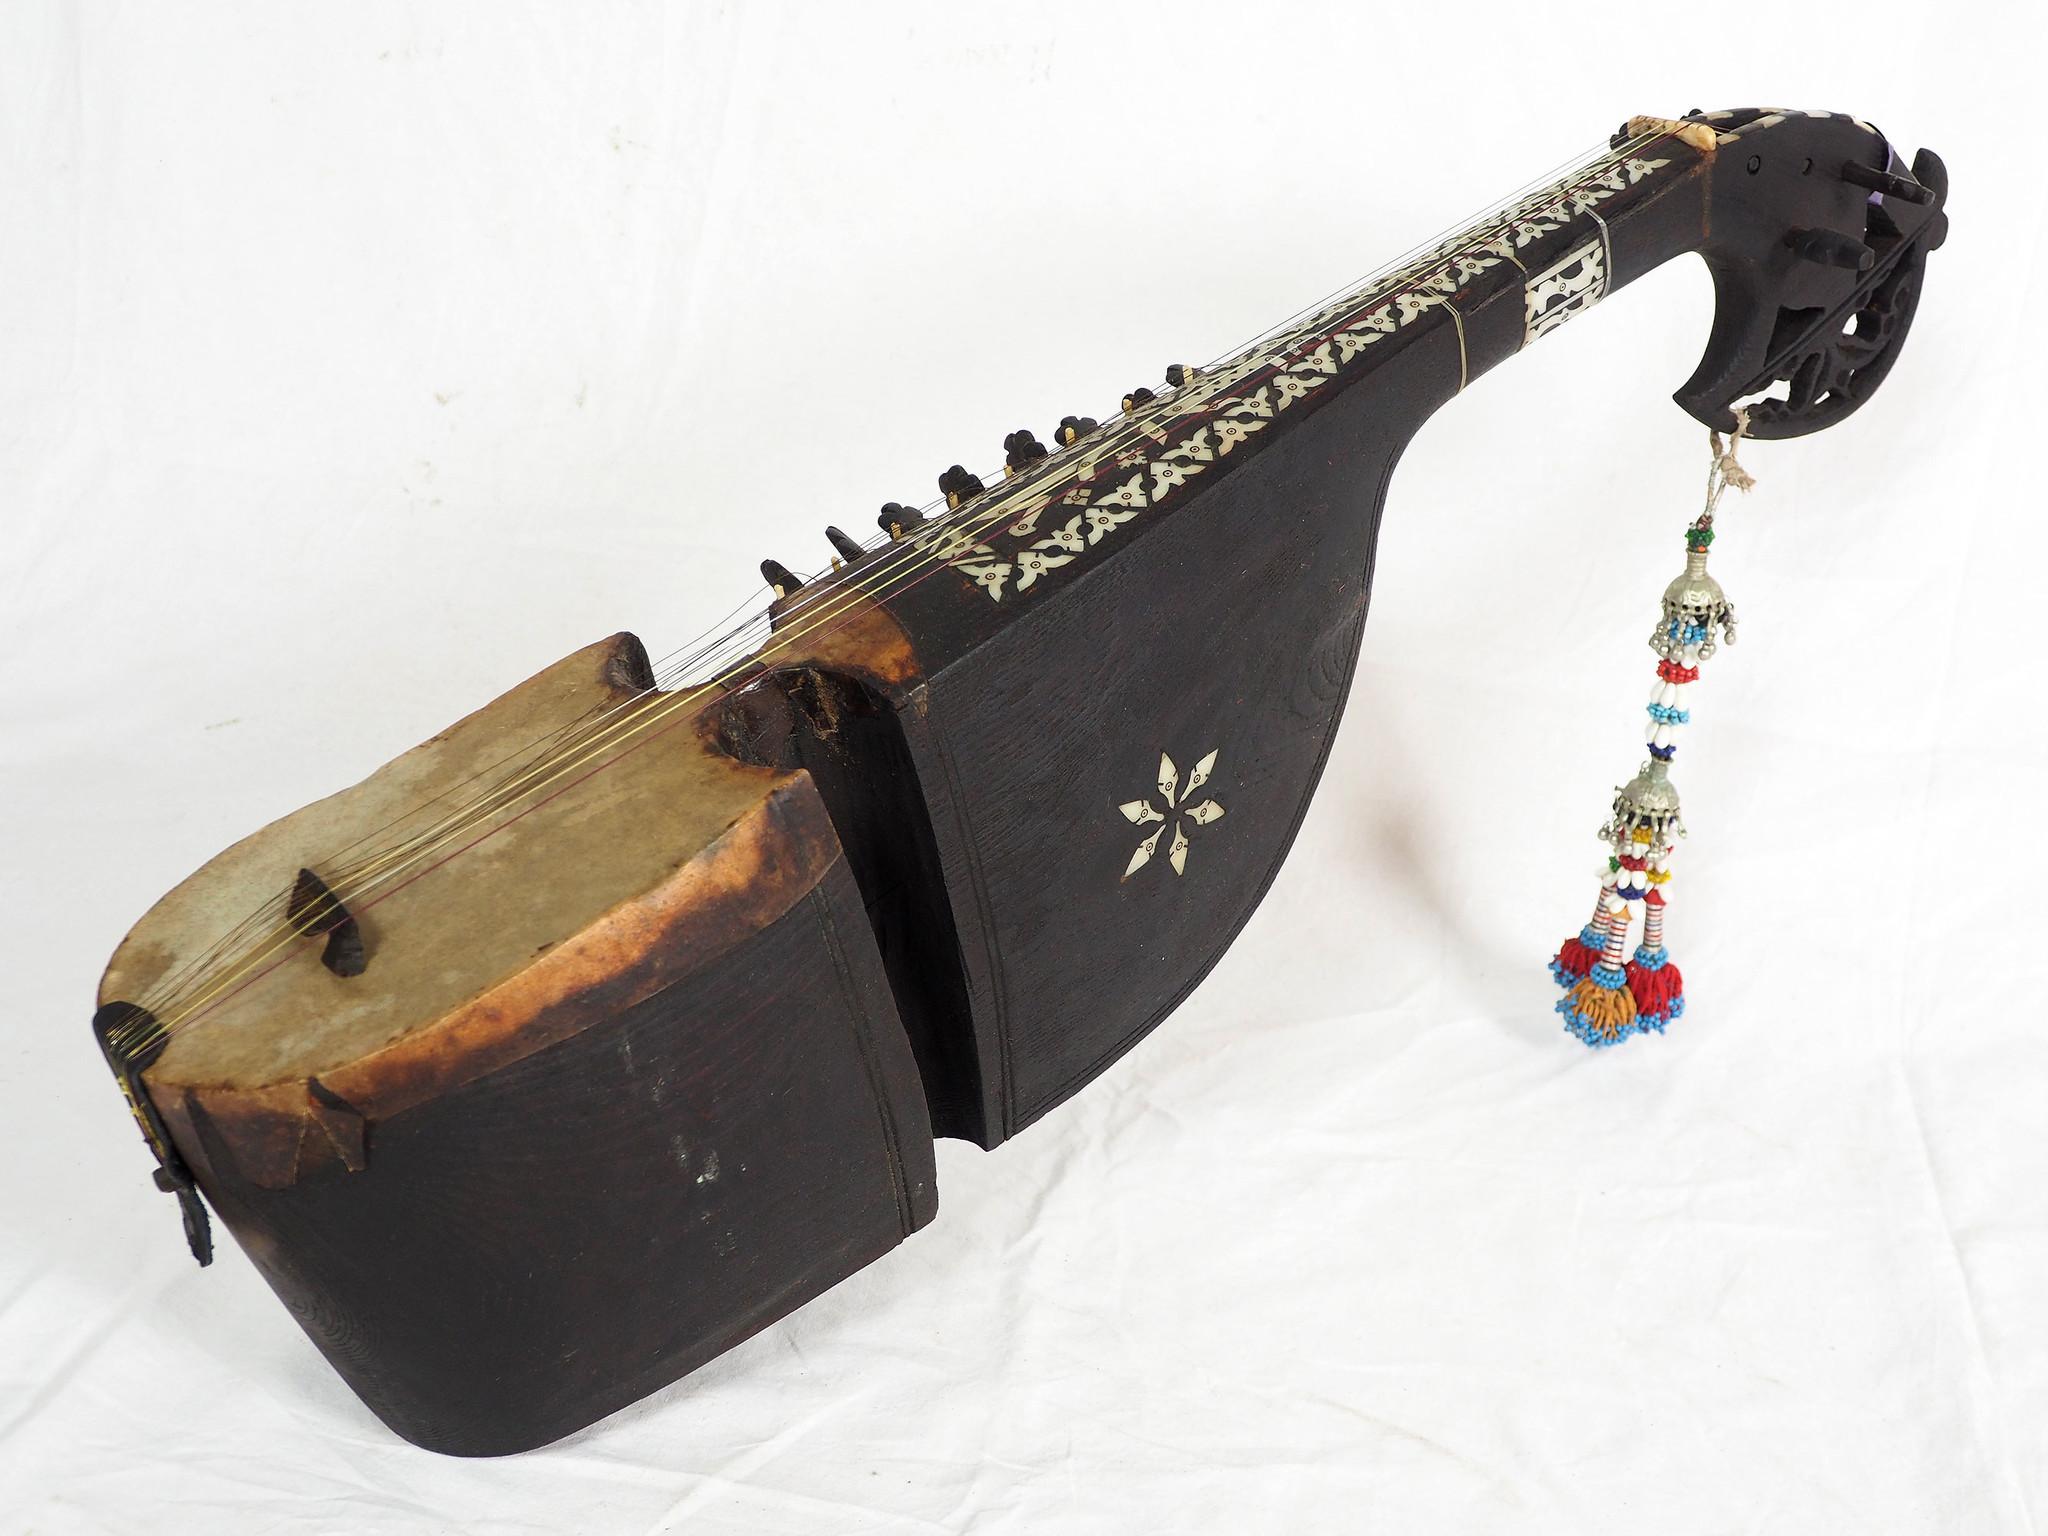 Afghan musikinstrumen Bubab Nr-19/B